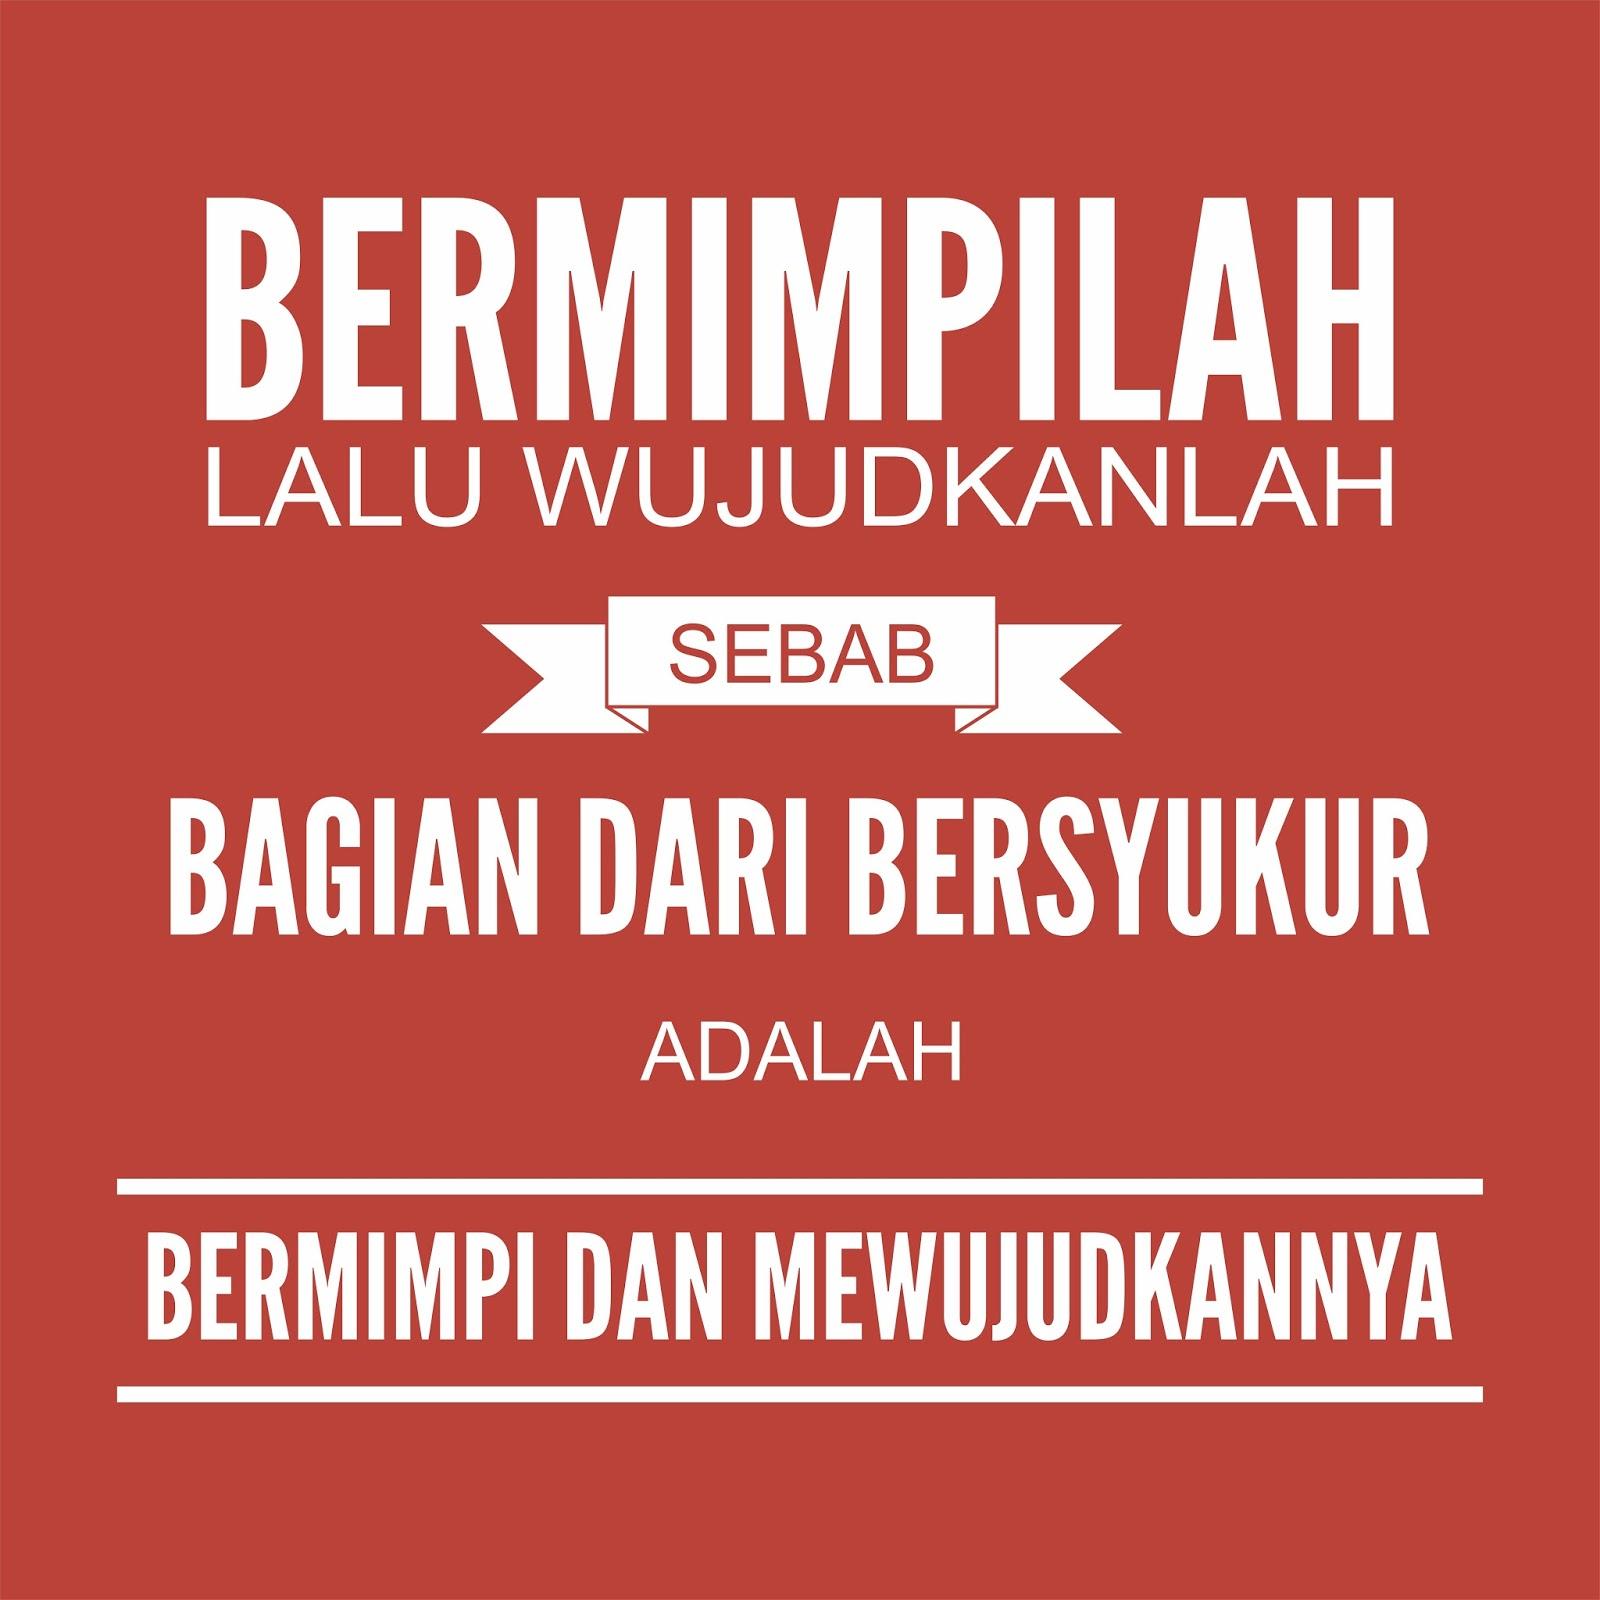 Chord Lagu Nike Ardila Tak Bersuara: Poster Motivation Quotes Kesadaran